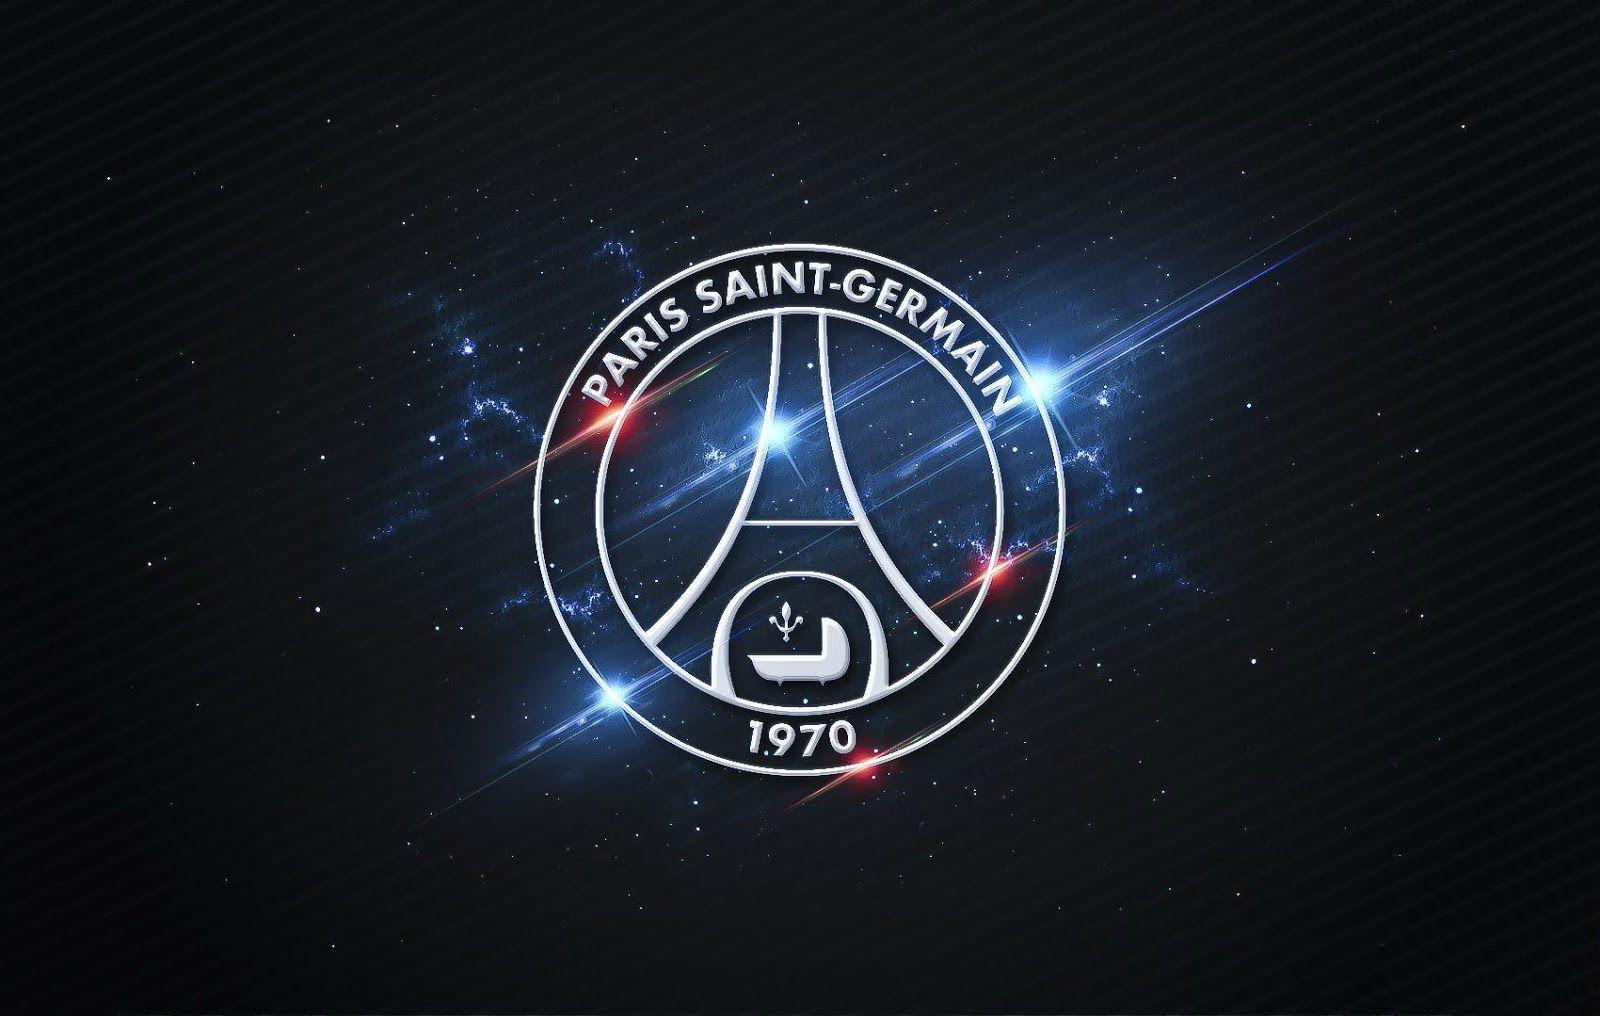 Manchester United Logo Wallpaper 3d Paris Saint Germain Psg Wallpapers Wallpaper Cave